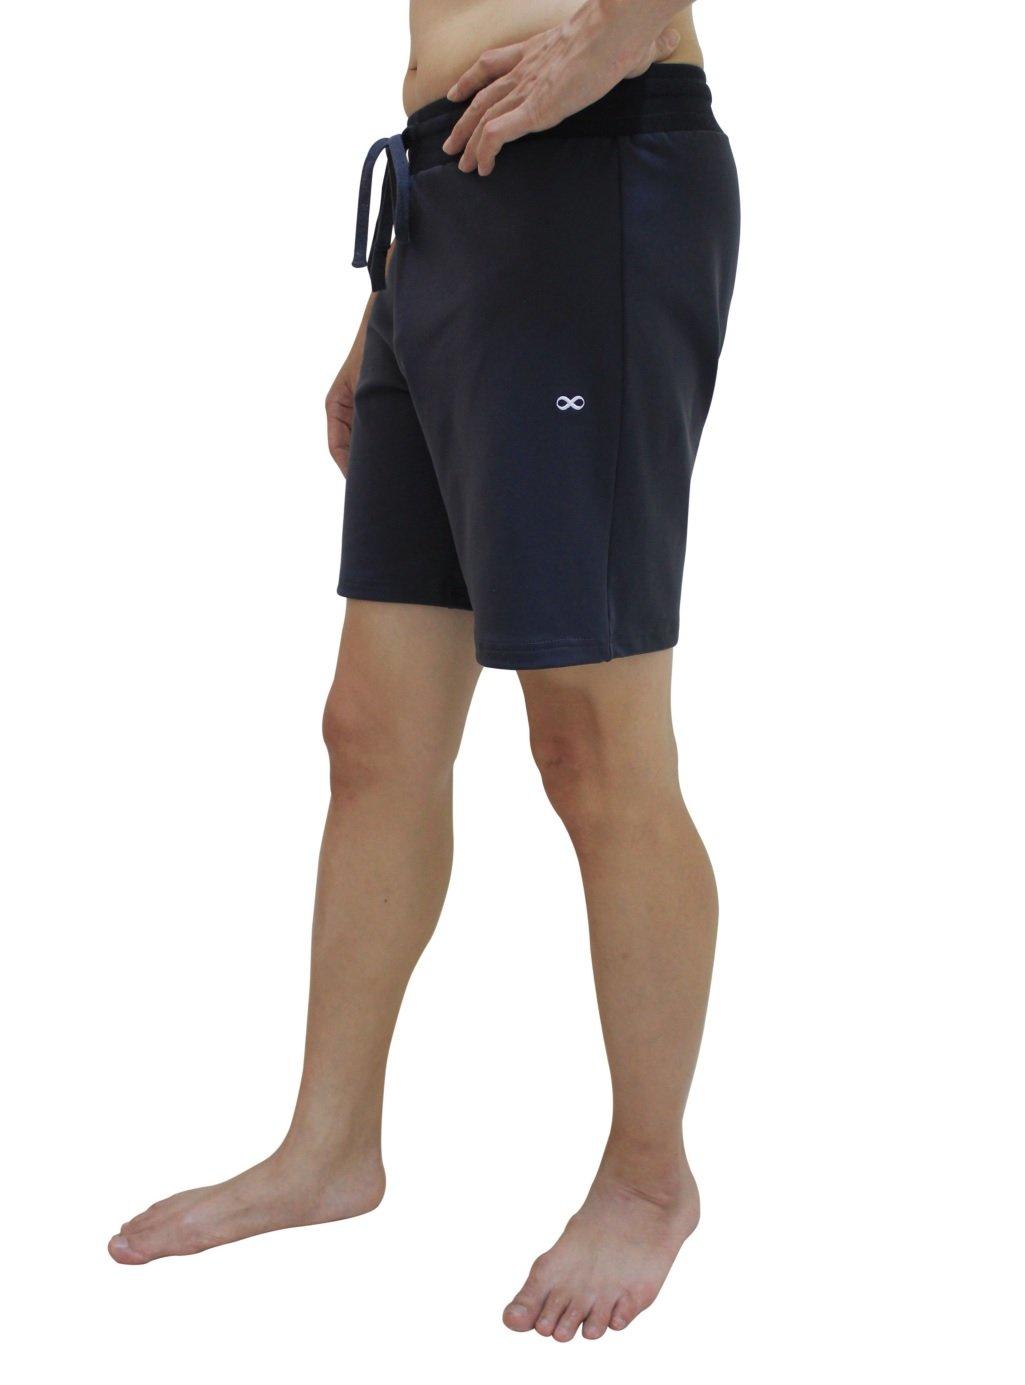 YogaAddict Yoga Shorts for Men, Quick Dry, No Pockets, for Any Yoga (Bikram, Hot Yoga, Hatha, Ashtanga), Pilates, Gym, Grey with Inner Liner - Size S by YogaAddict